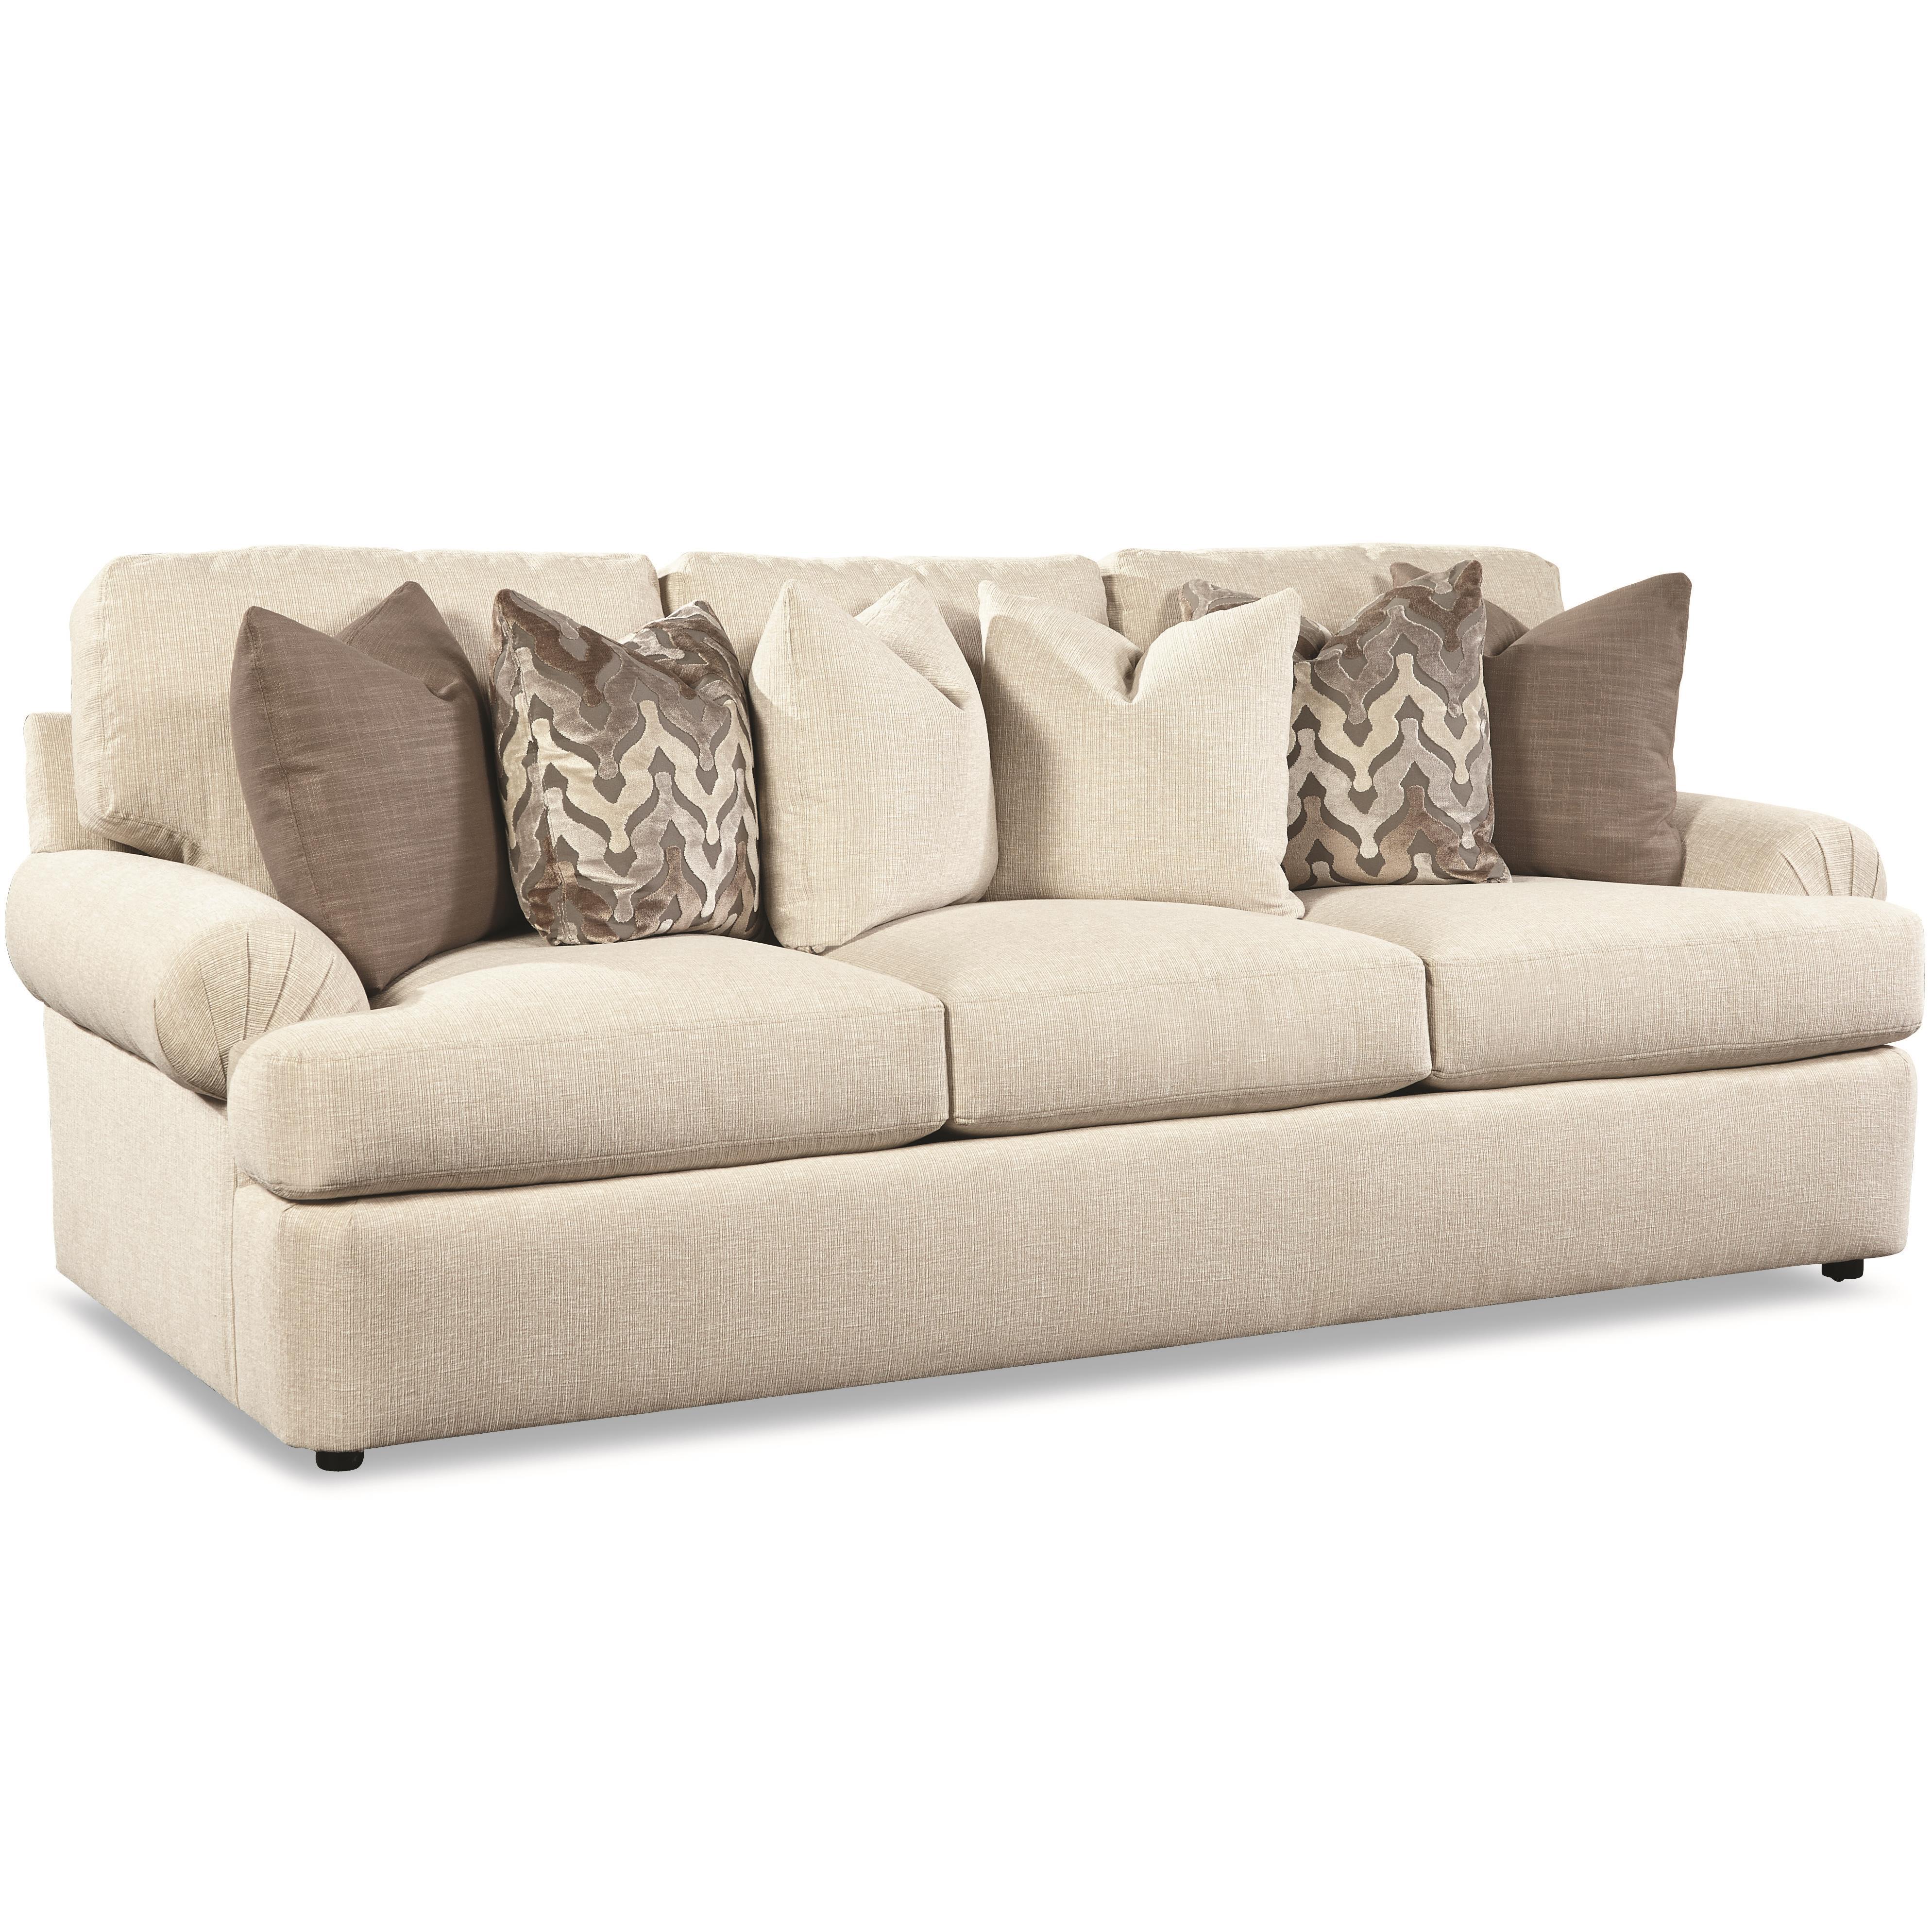 2081 Sofa by Huntington House at Baer's Furniture